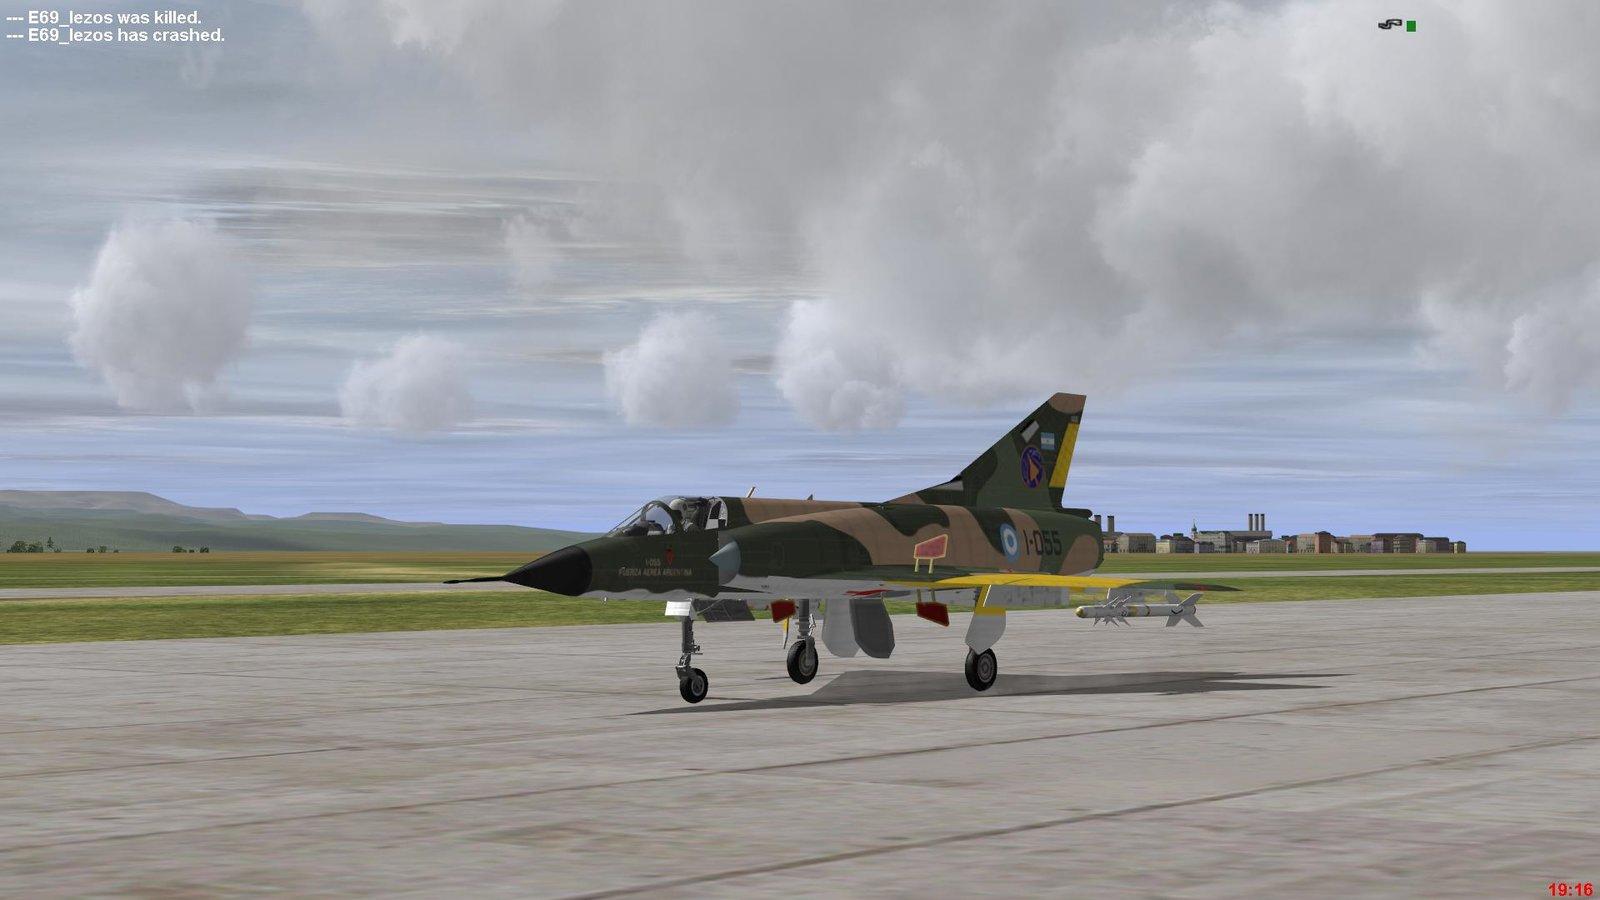 Grupo 8 de Caza, VIII Brigada Aerea, Fuerza Aerea Argentina